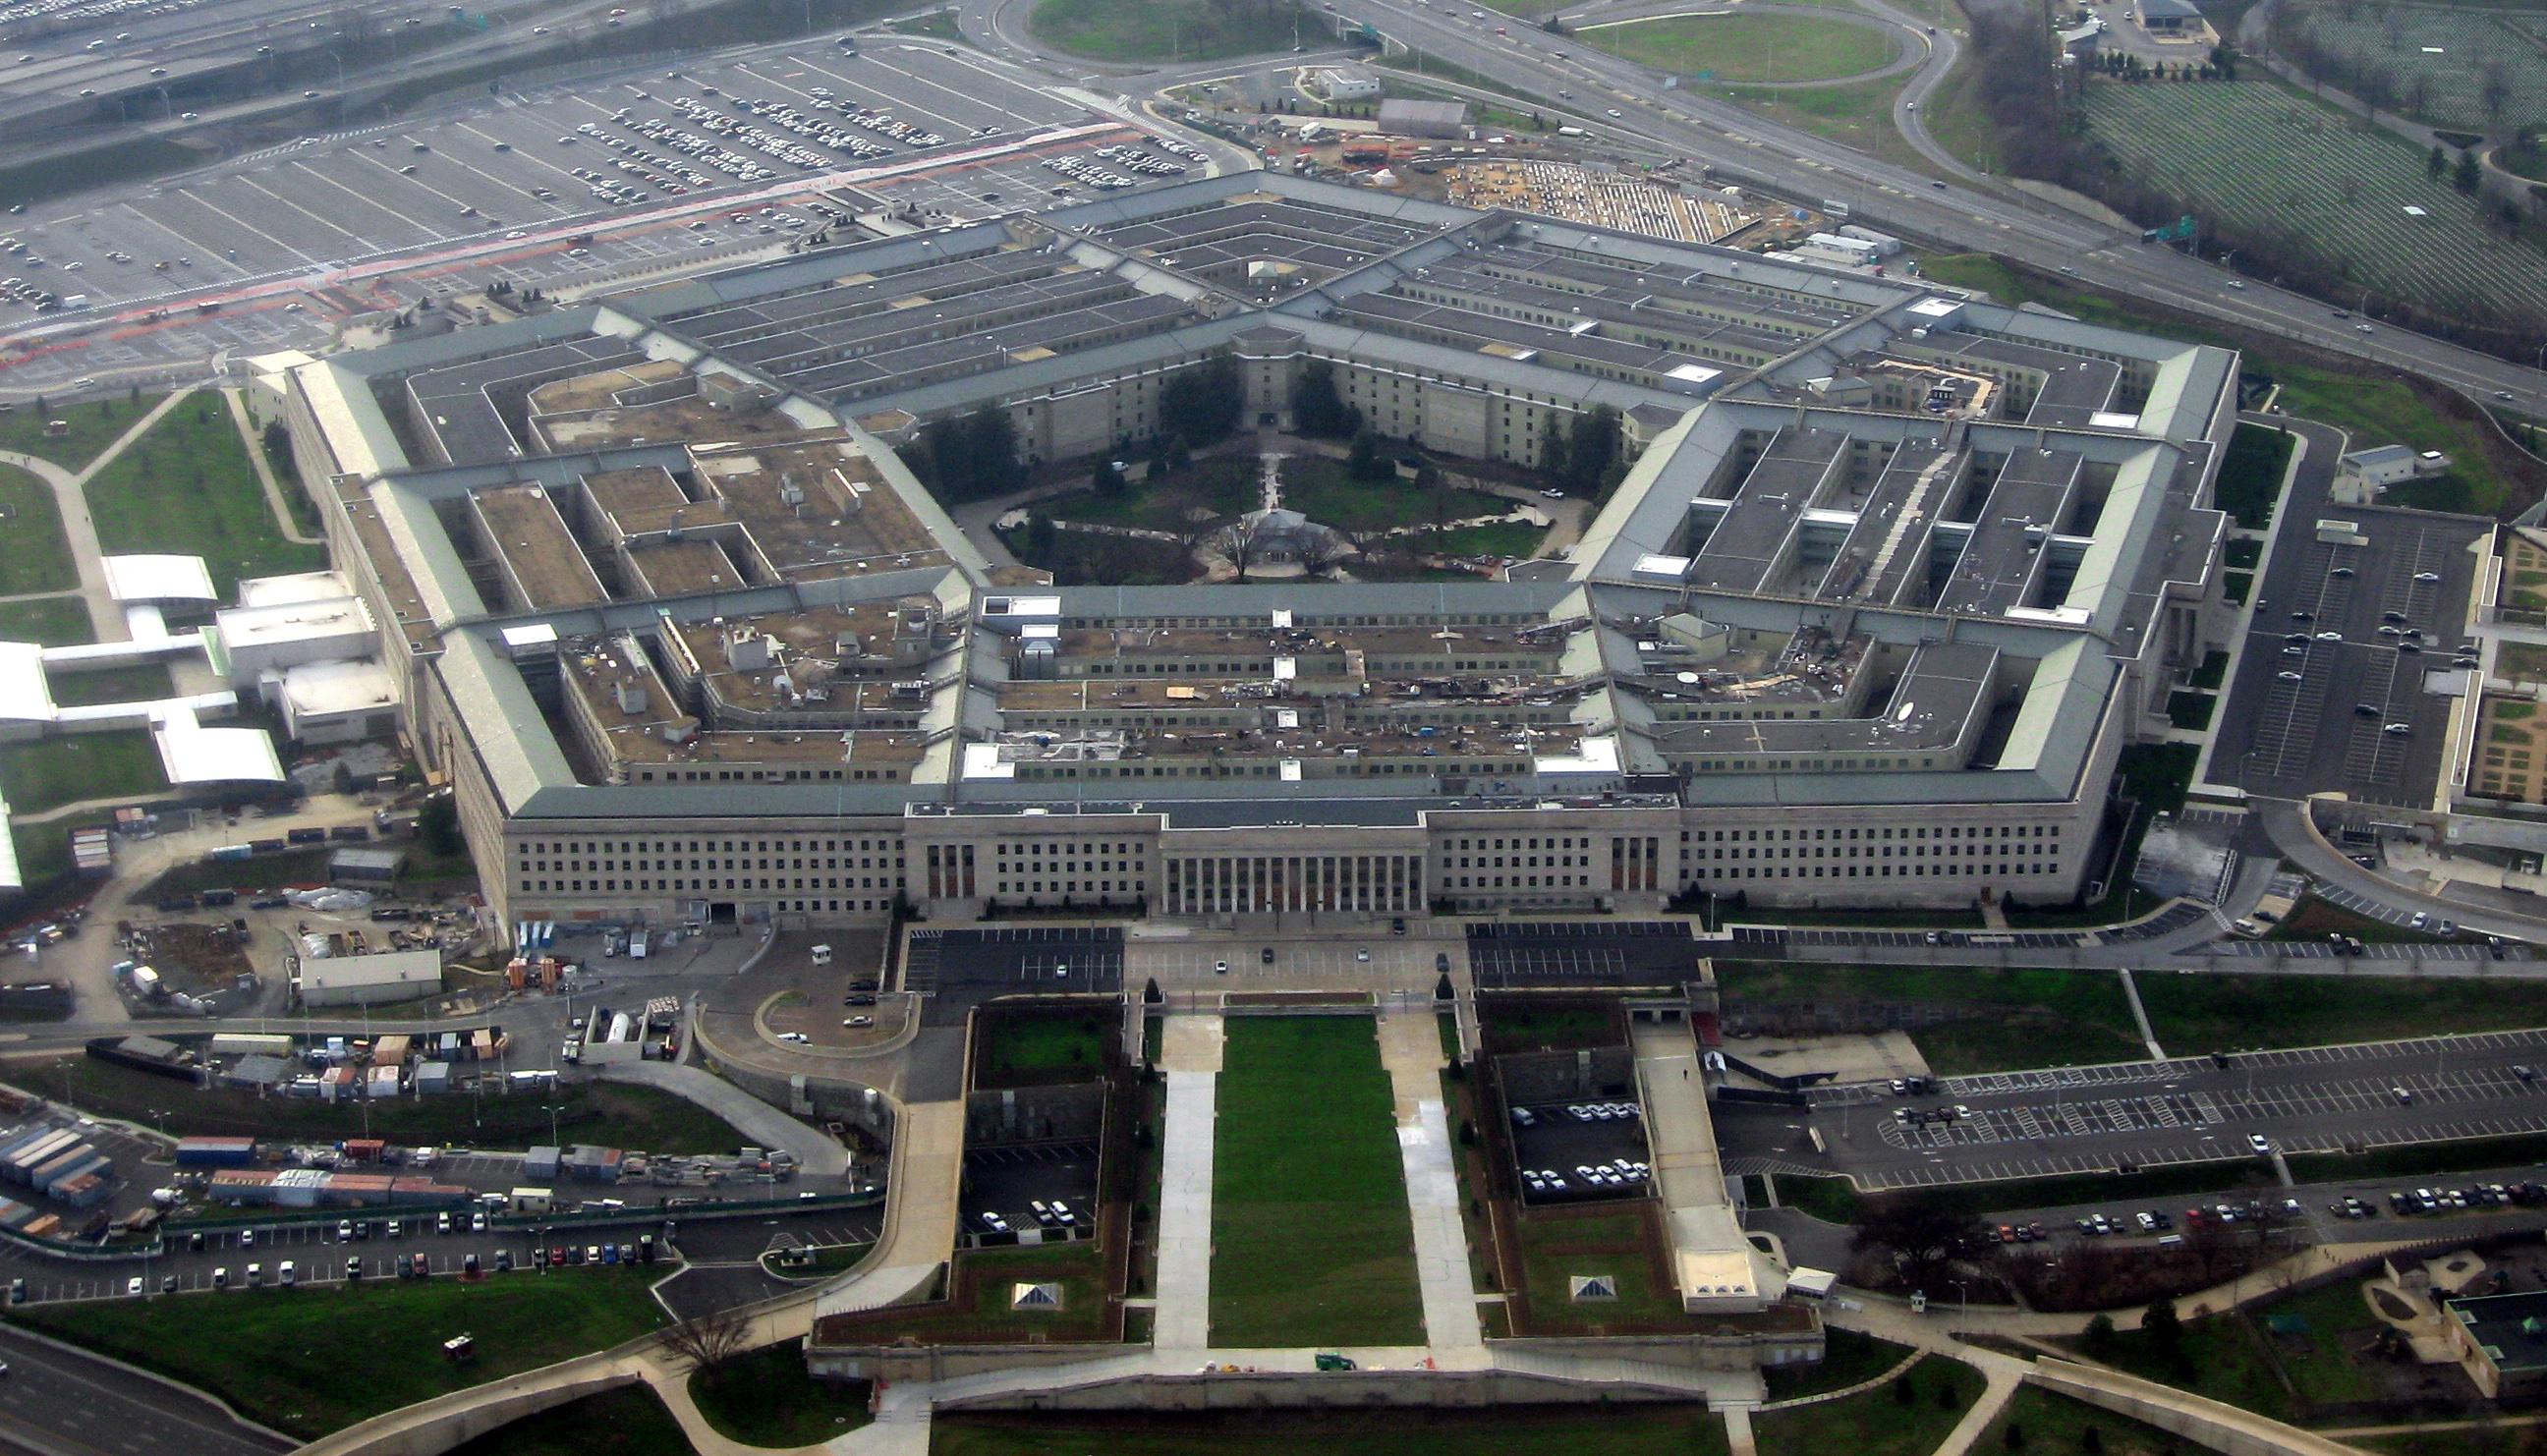 The_Pentagon_January_2008.jpg